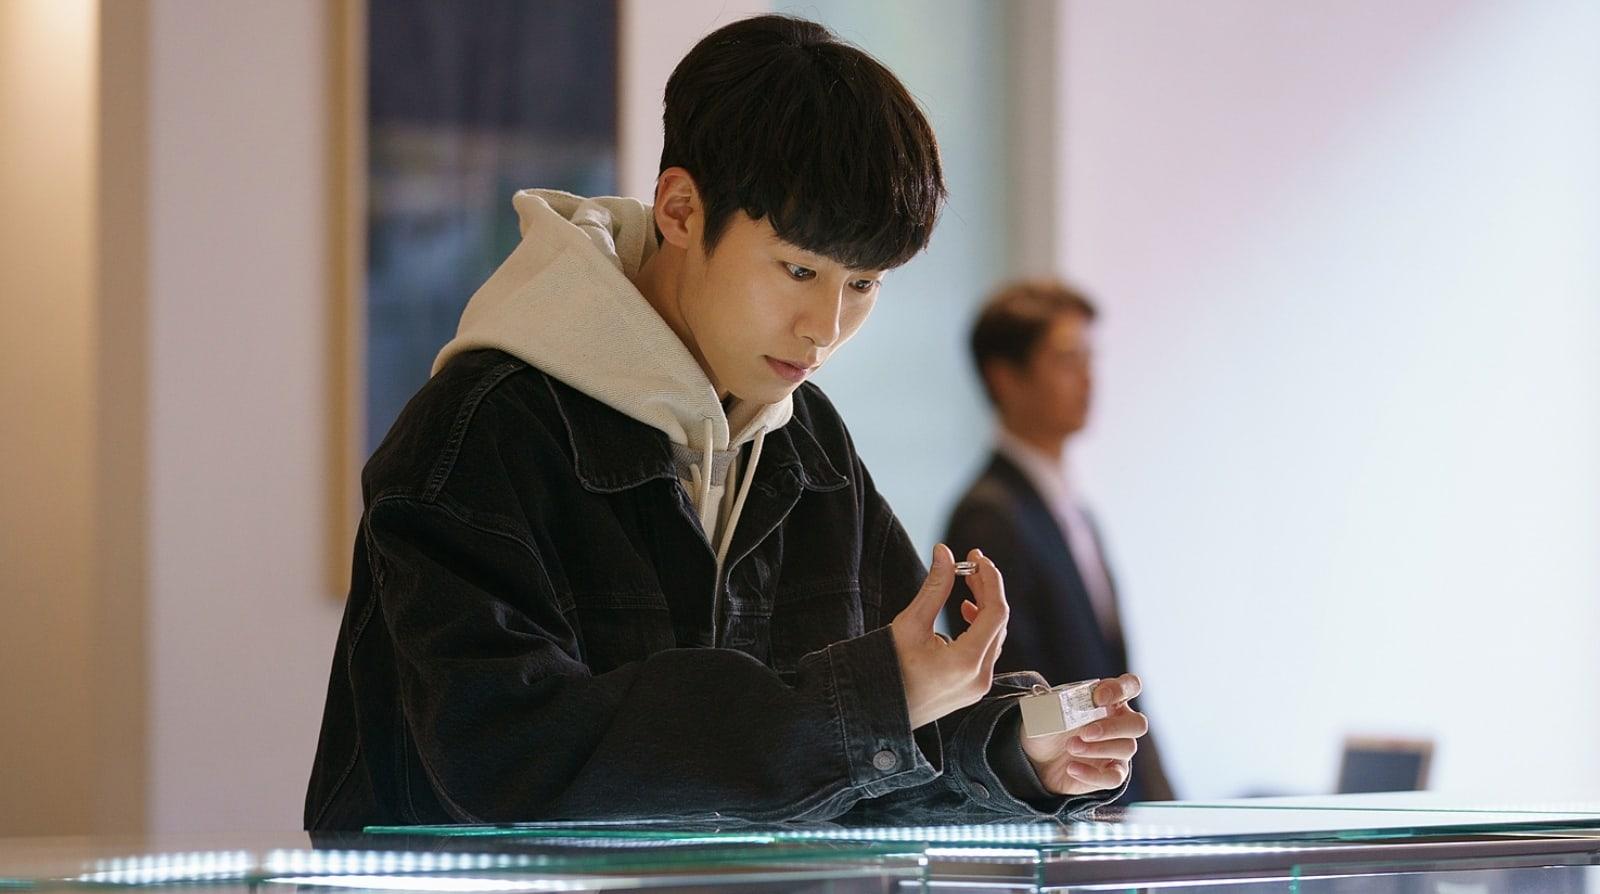 """Do Do Sol Sol La La Sol"": Lee Jae Wook is shocked by the sudden appearance of CLC's Eunbin"